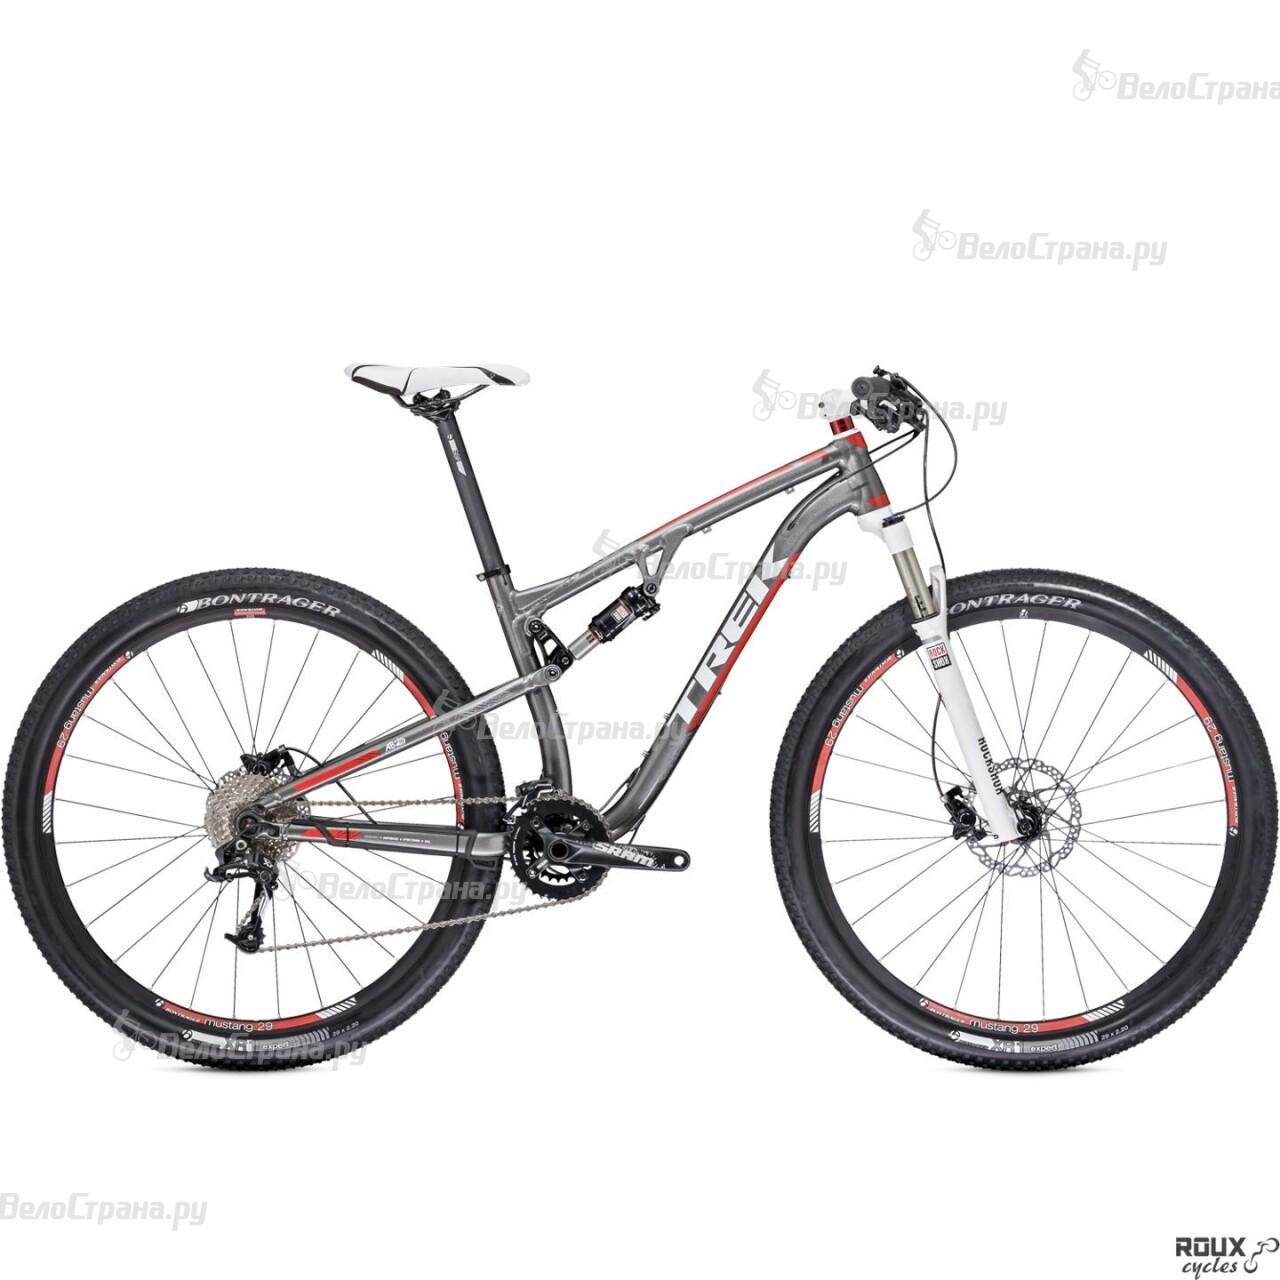 Велосипед Trek Superfly FS 7 (2014) велосипед challenger mission lux fs 26 черно красный 16